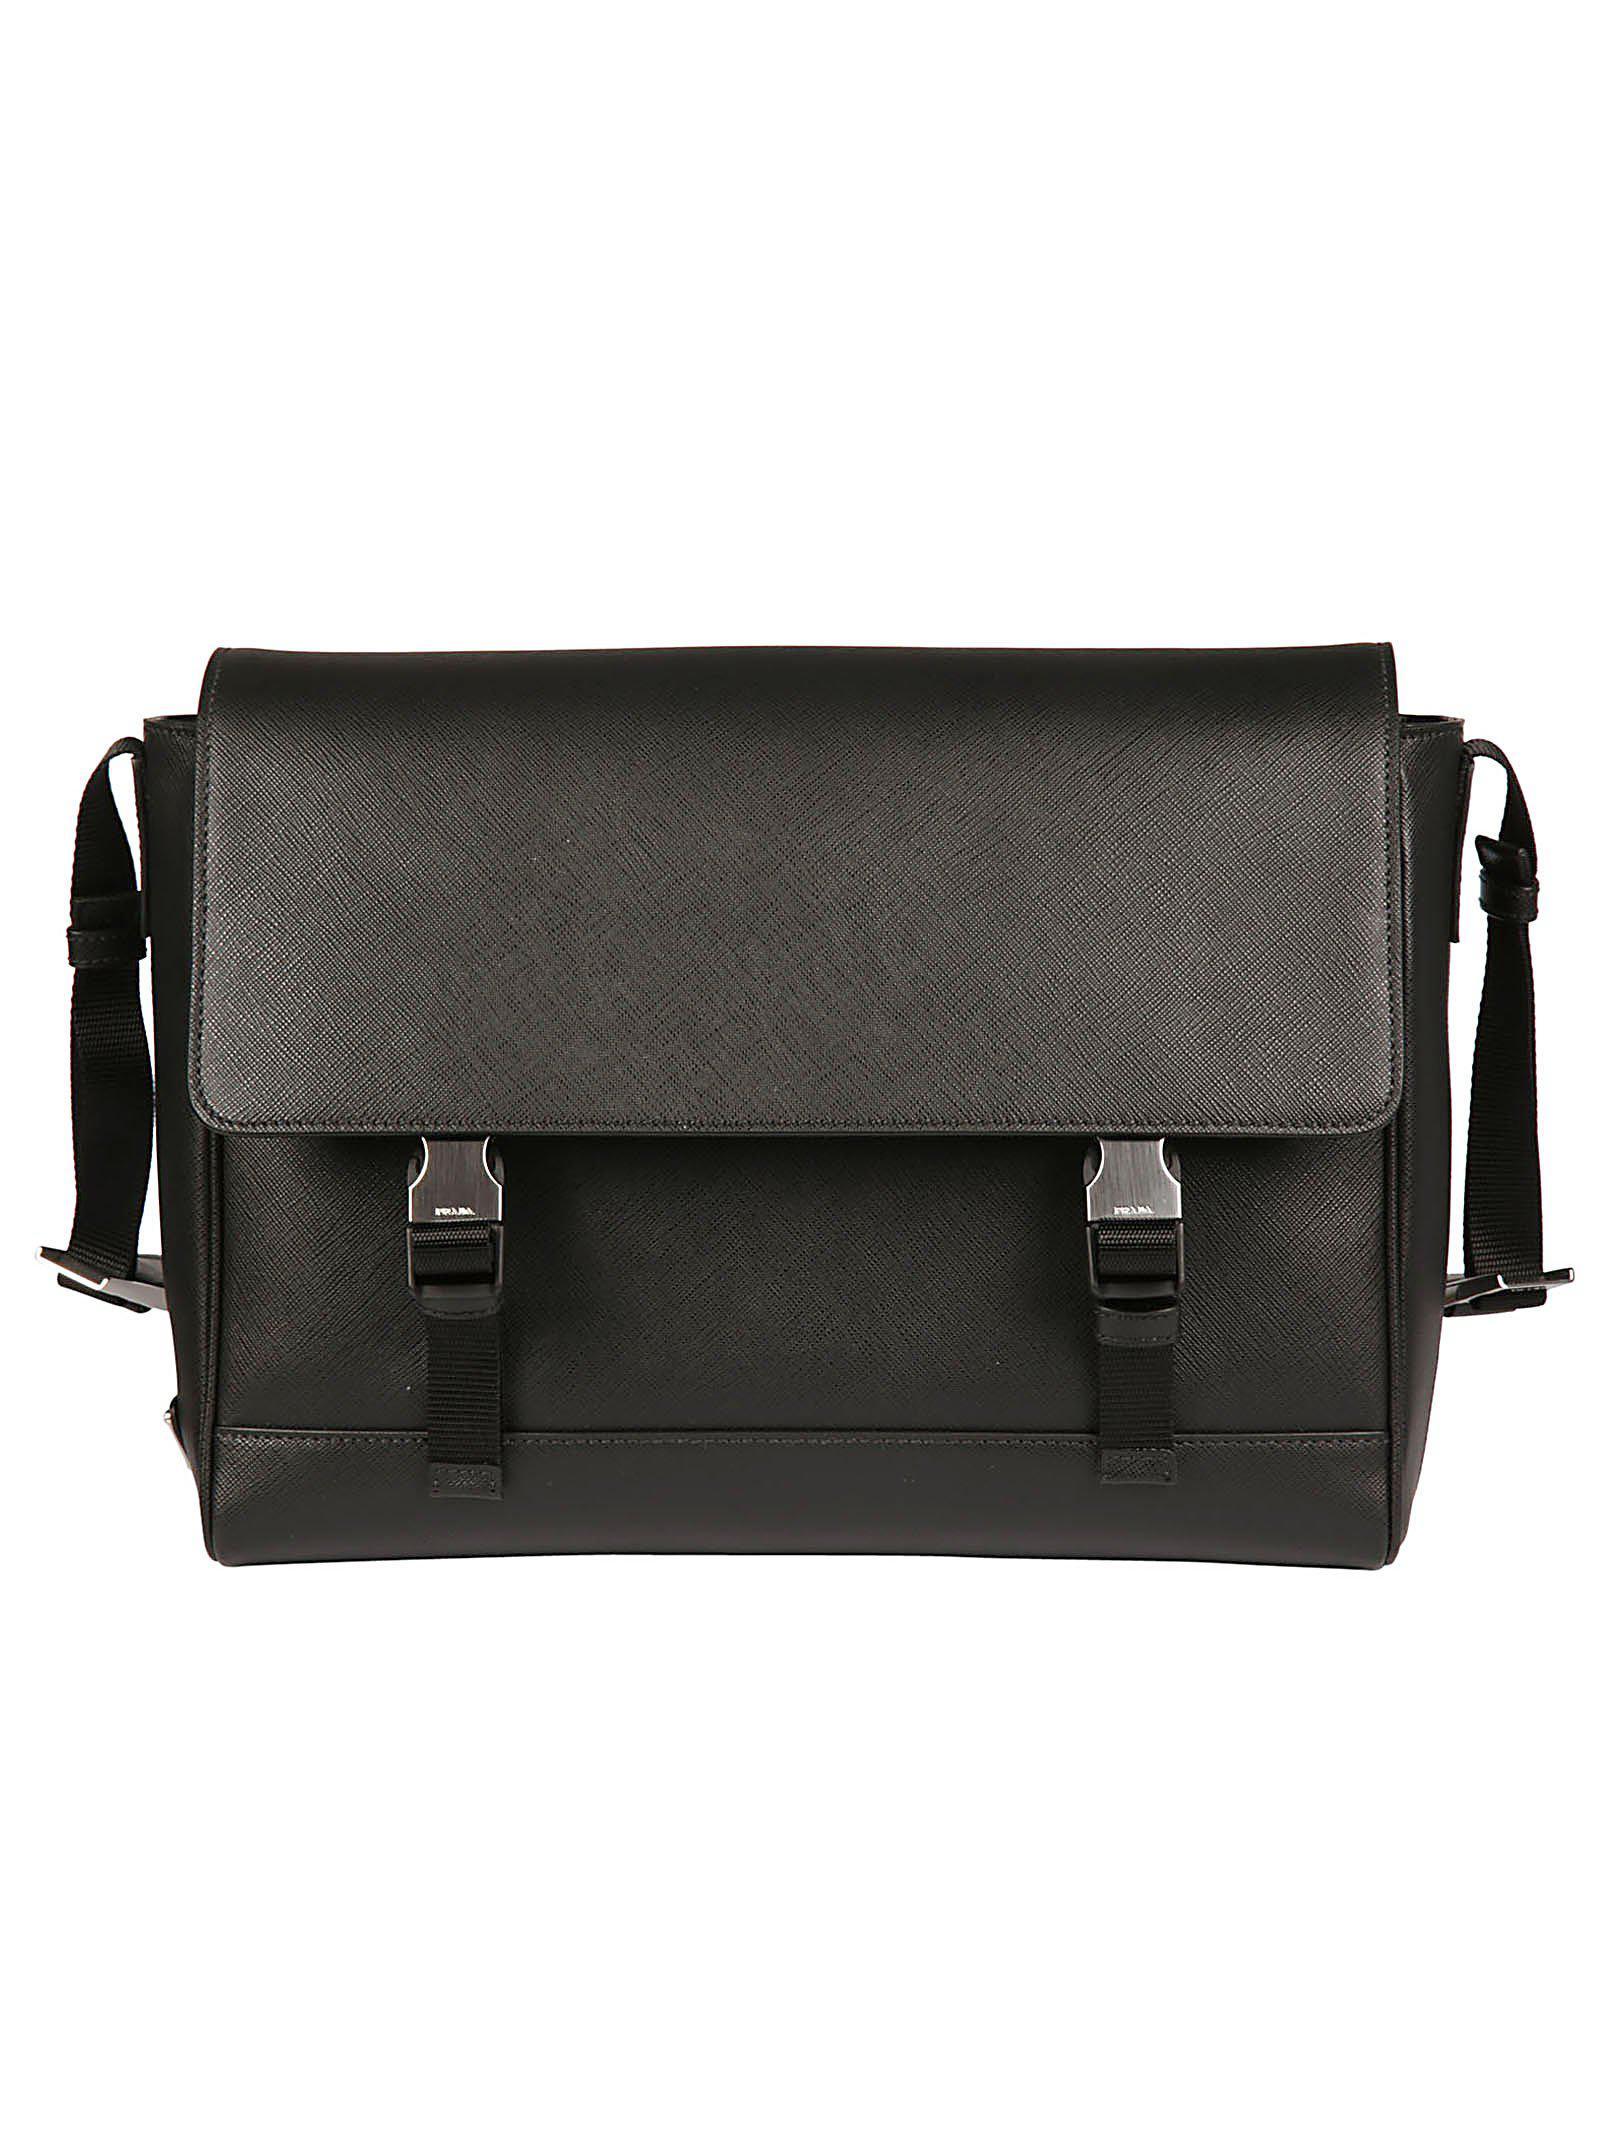 3056156d300801 Prada Logo Double Clipped Shoulder Bag in Black for Men - Lyst